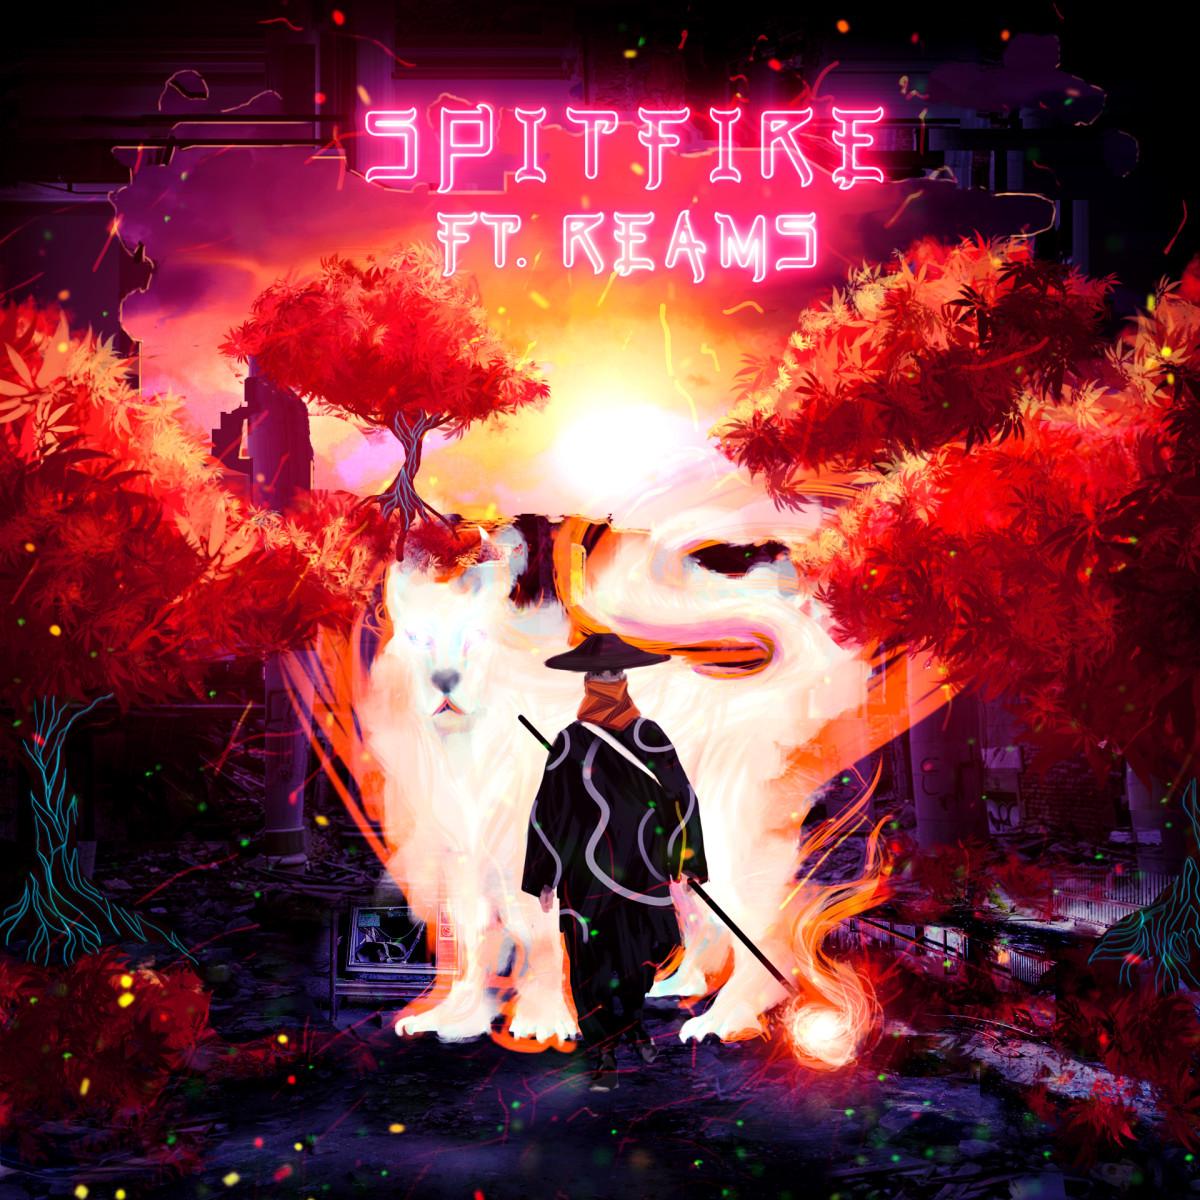 Spitfire_featReams_artworkv2